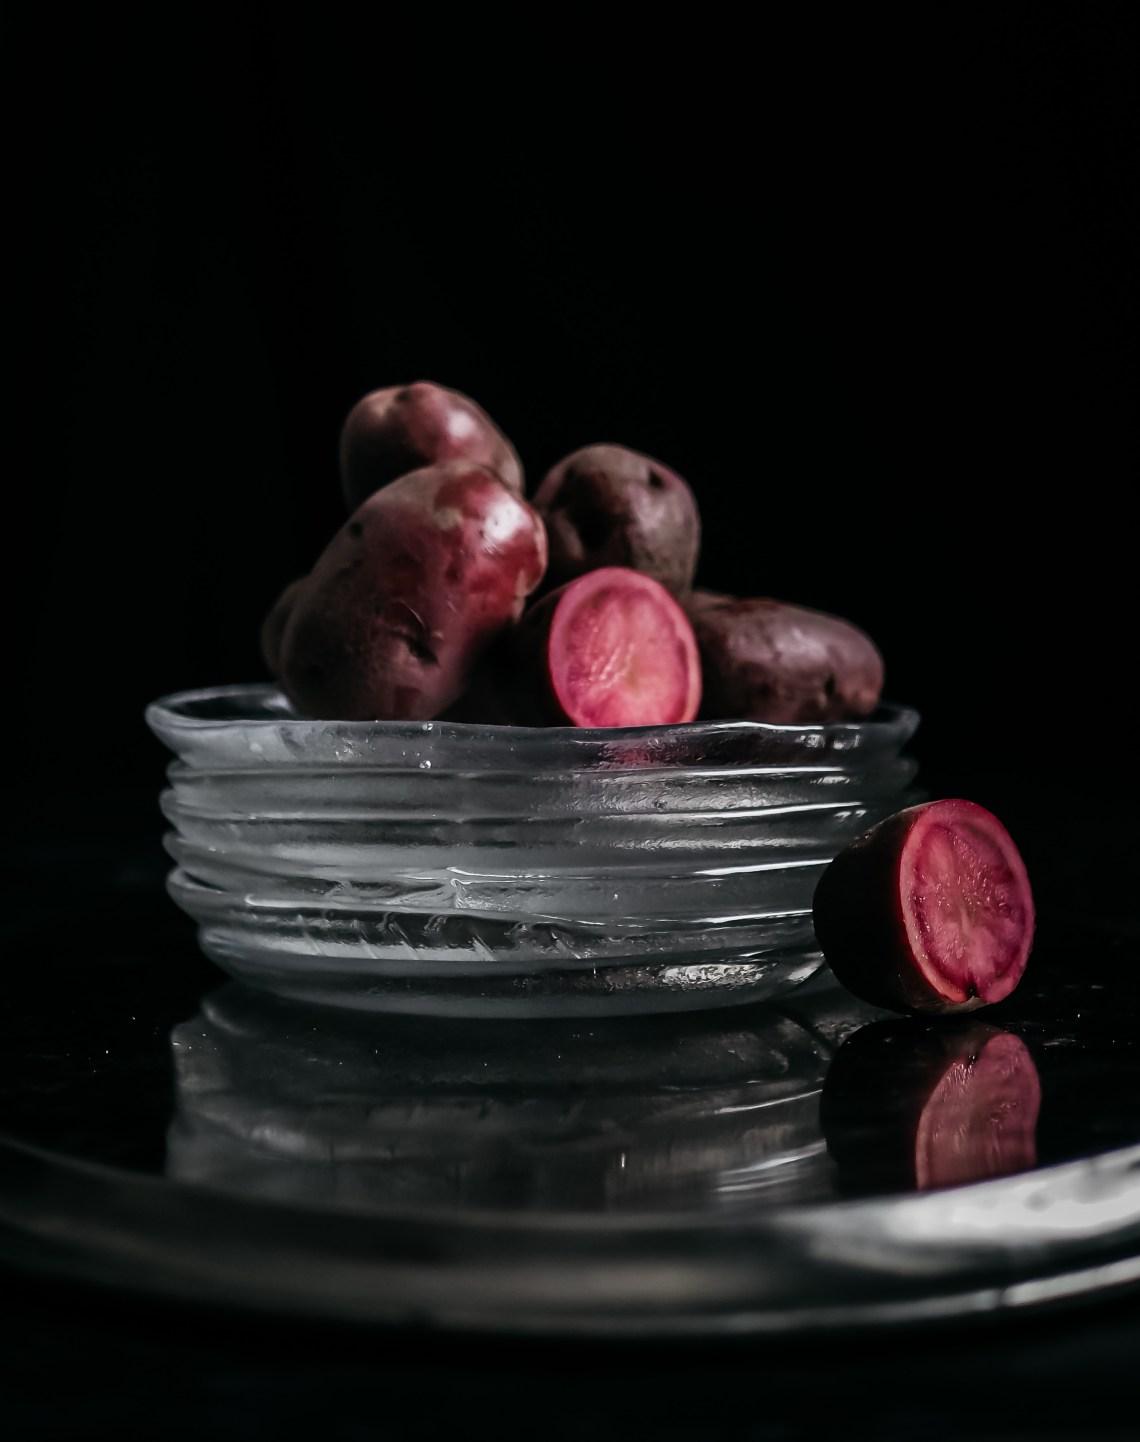 pinkki peruna